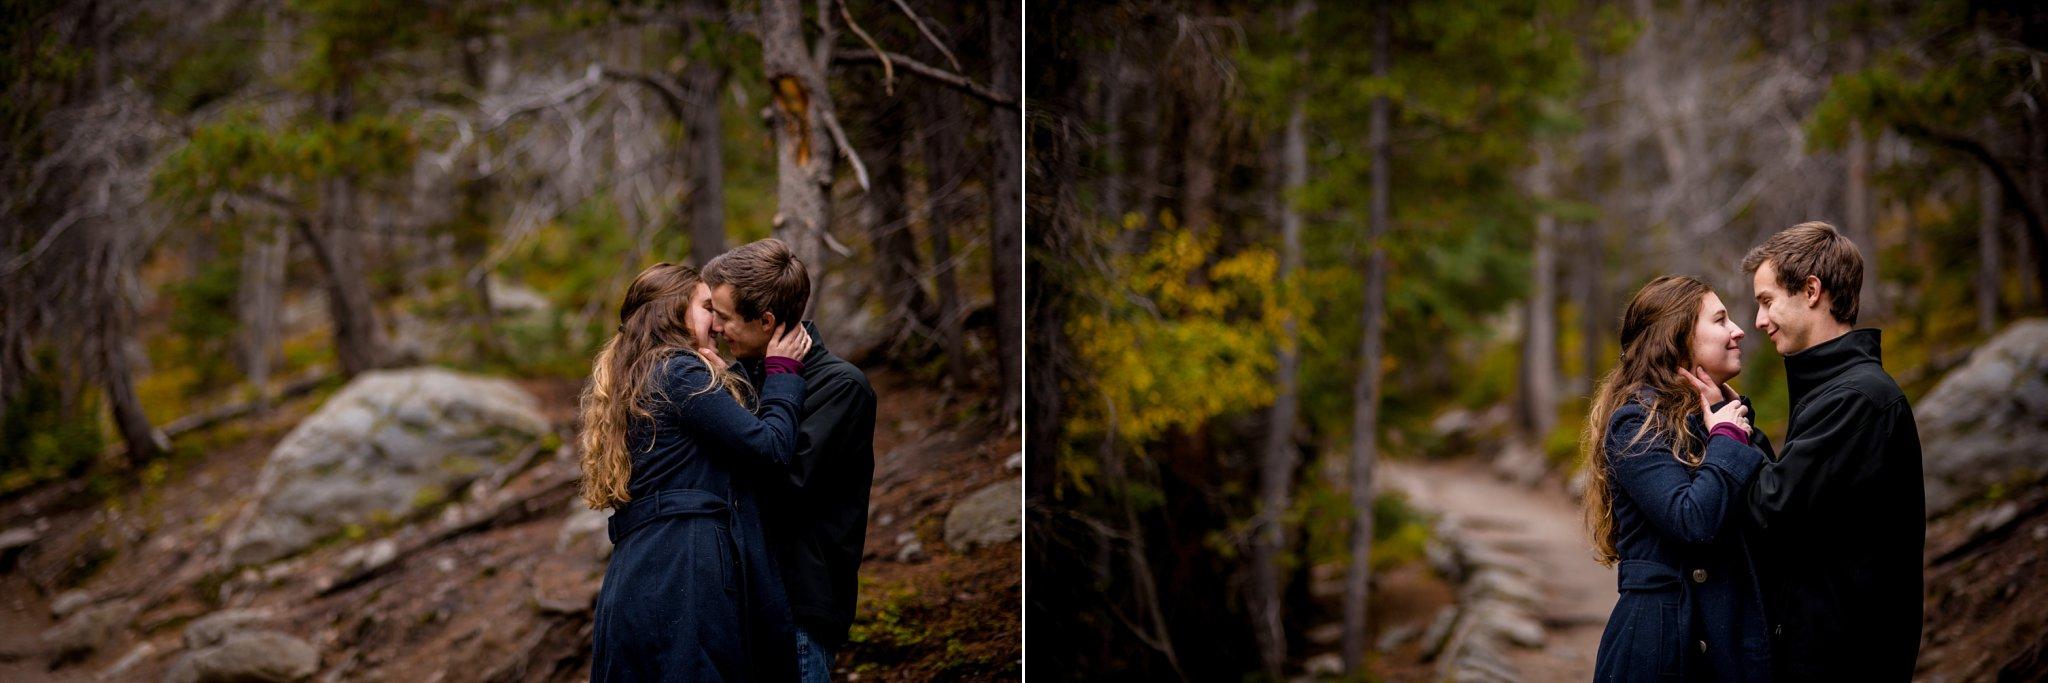 Rocky Mountain National Park Engagement Photos_0012.jpg